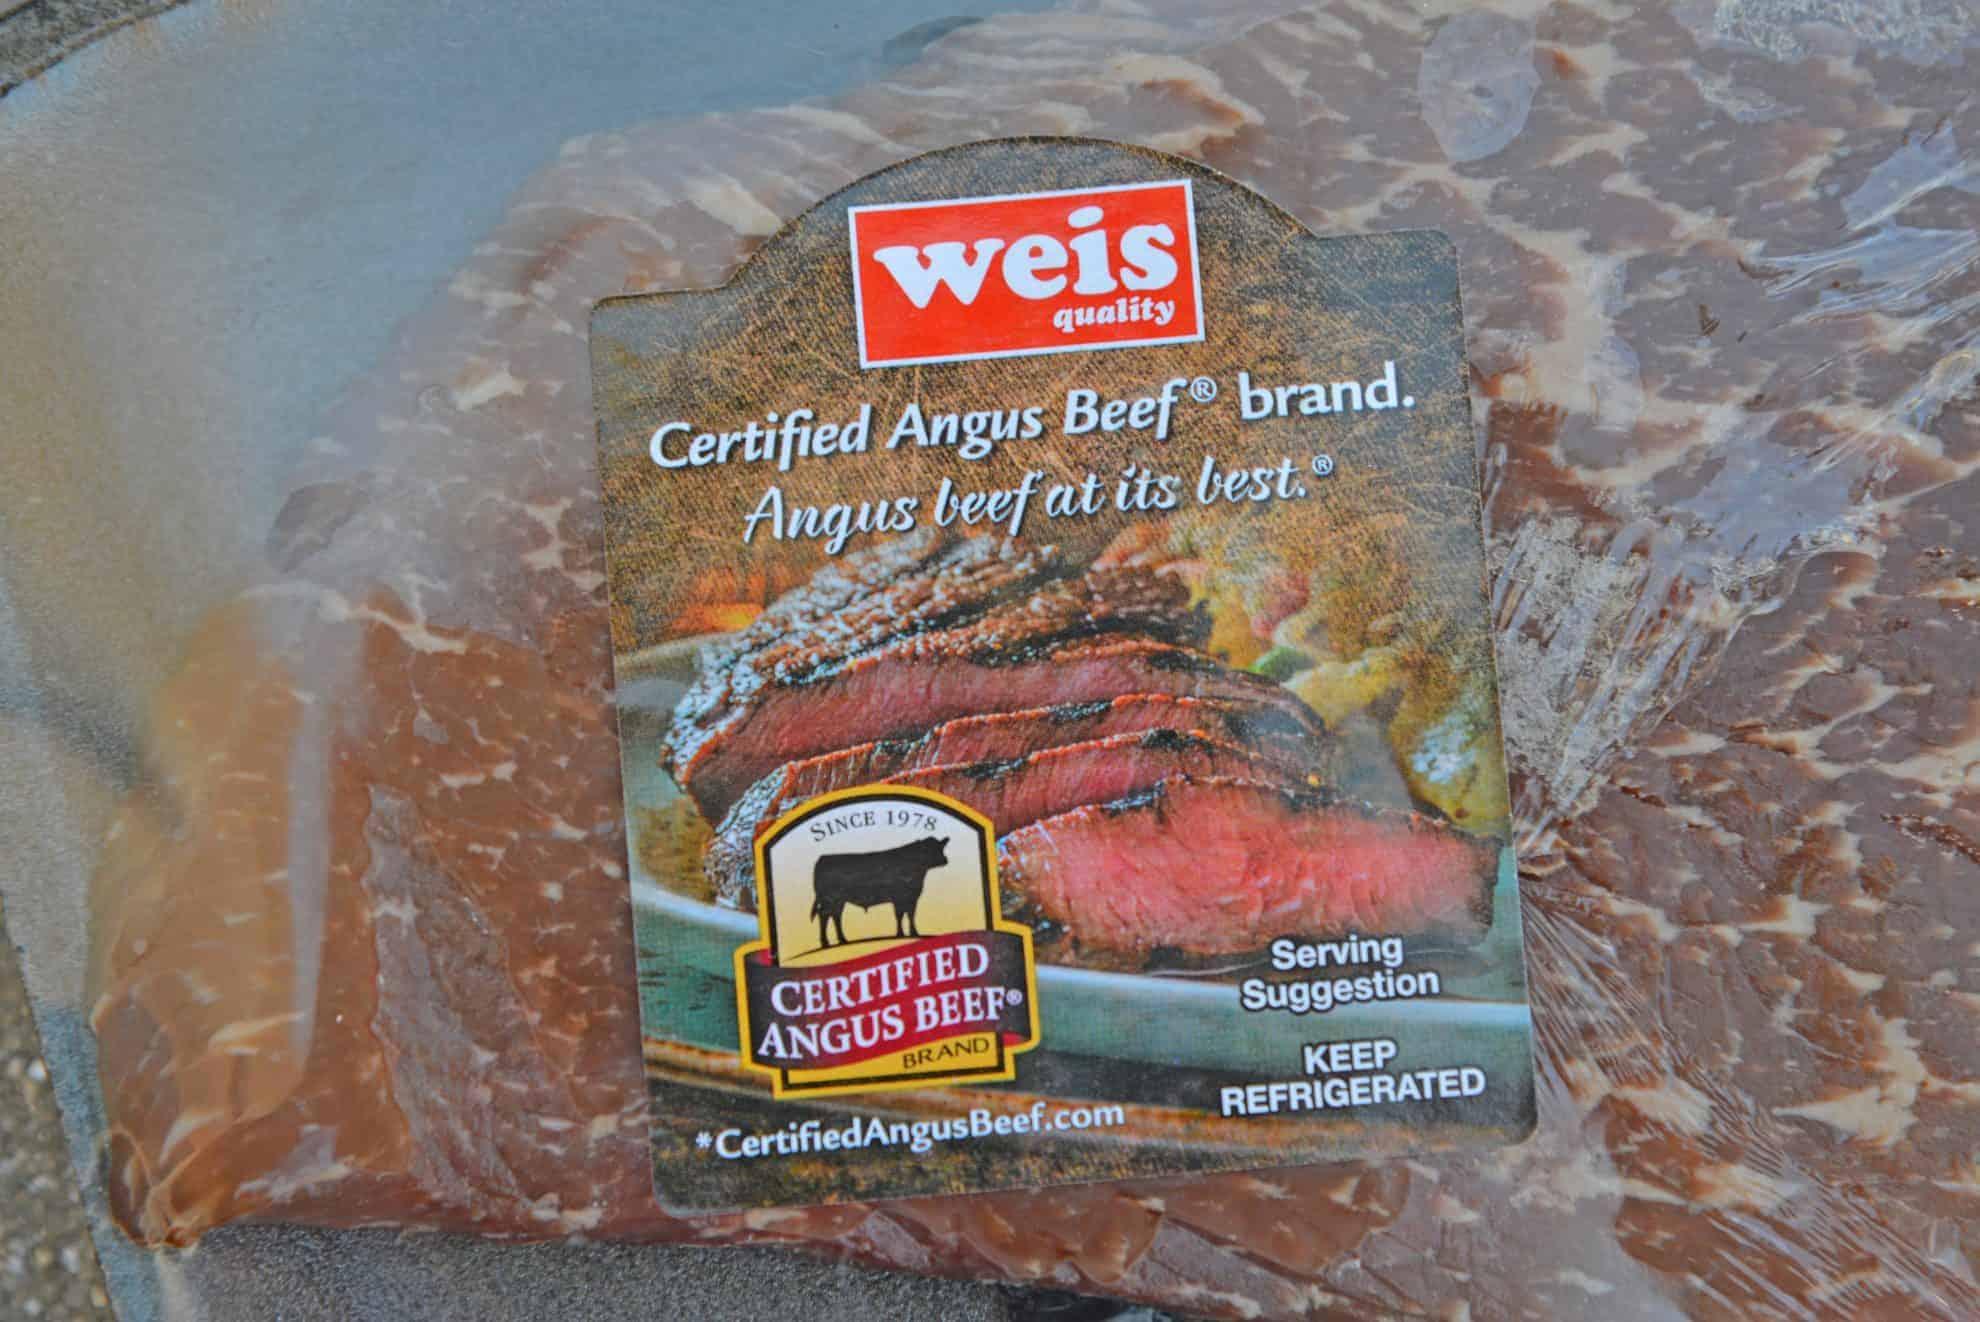 Certified Angus Beef brand beef